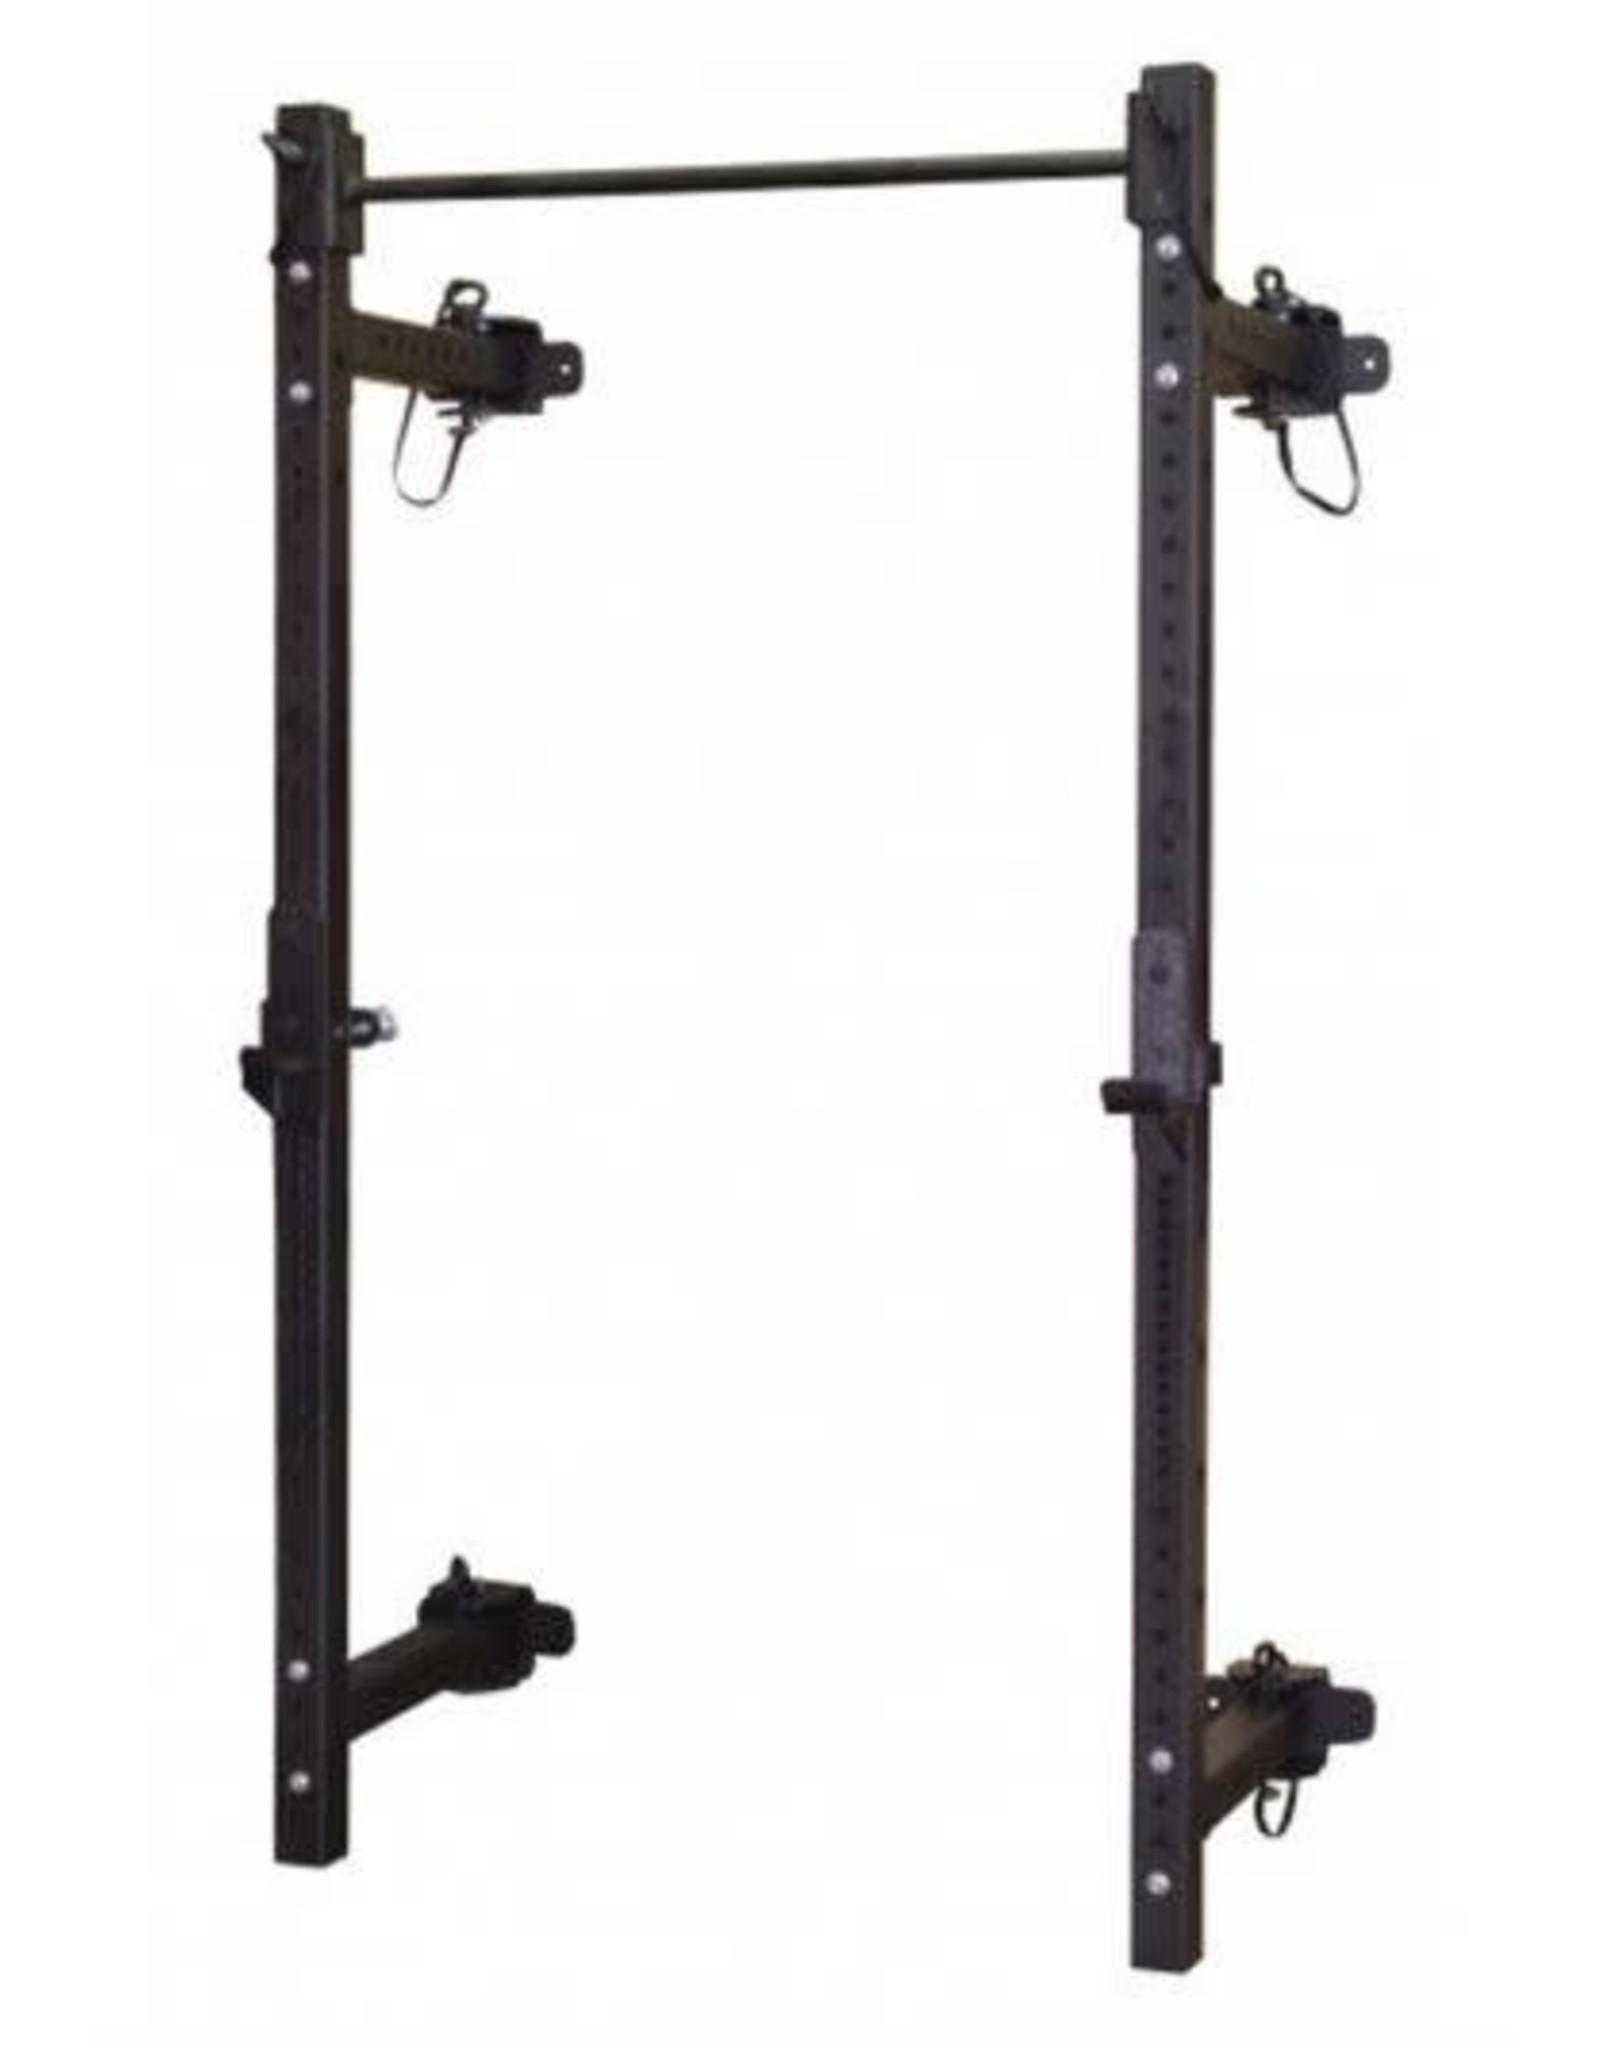 PROMAXIMA PROMAXIMA Folding Power Rack (Wall Mounted) 3x2